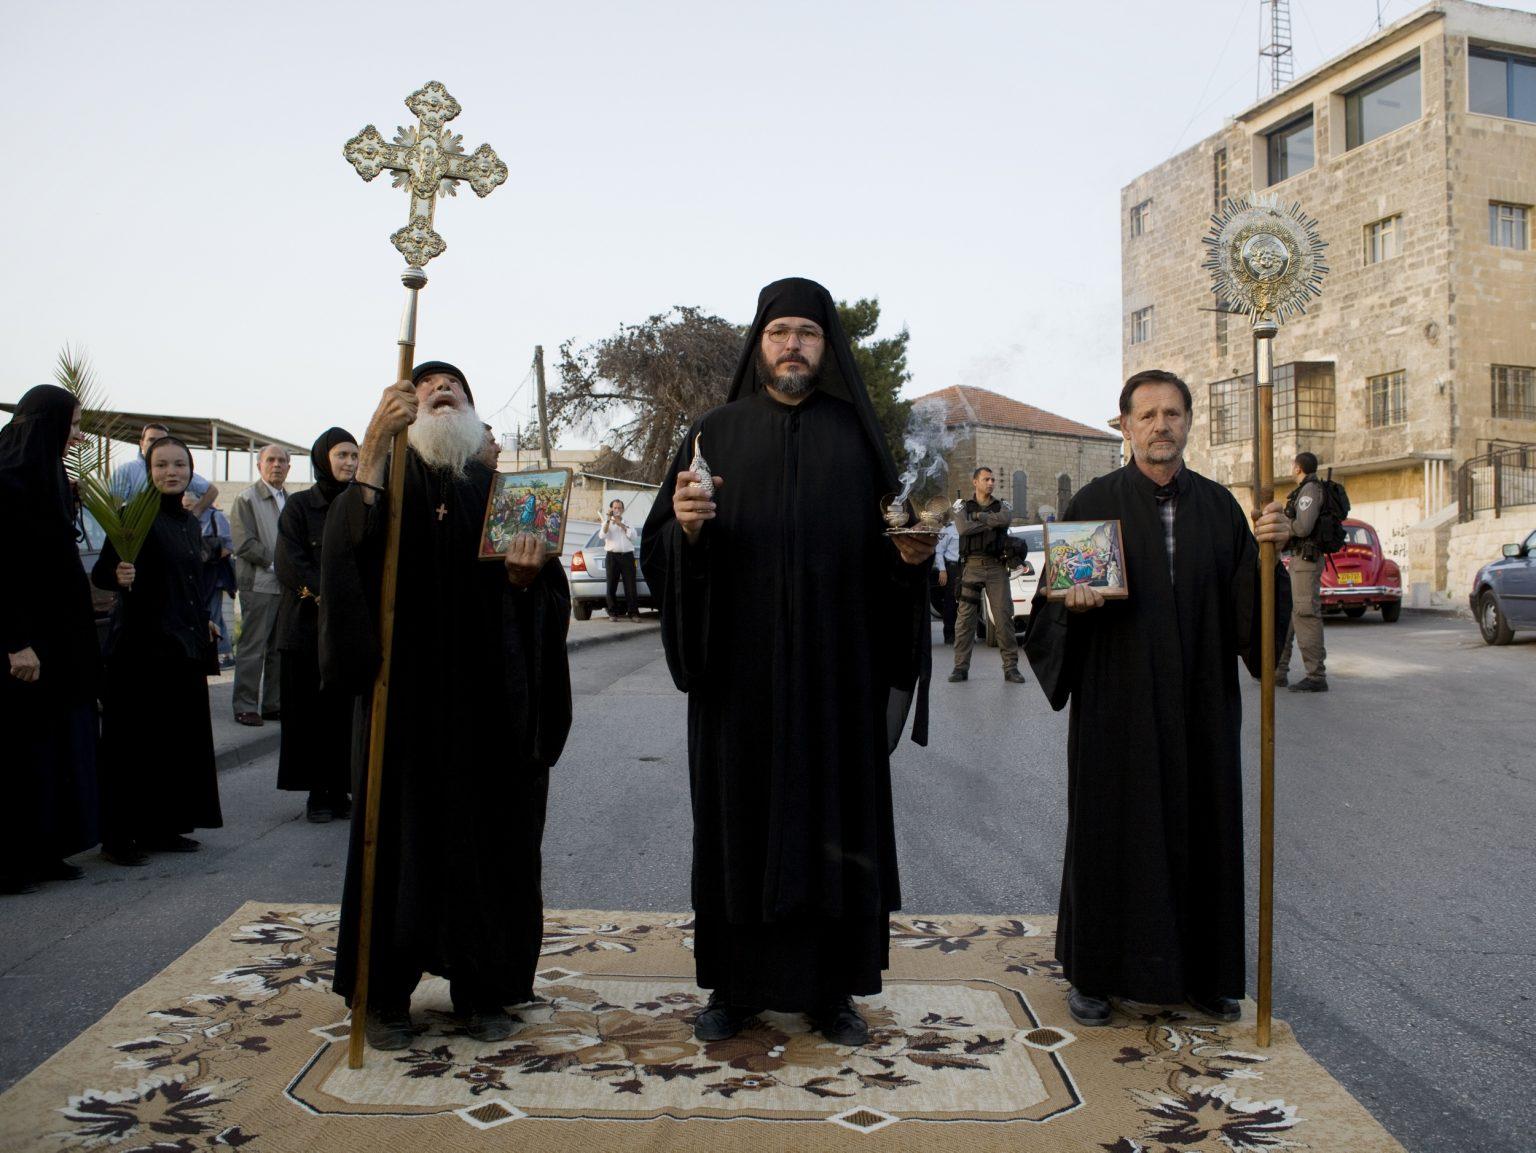 Greek Orthodox Christians during the Palm Sunday in East Jerusalem celebrating the entrance of Jesus in Jerusalem.